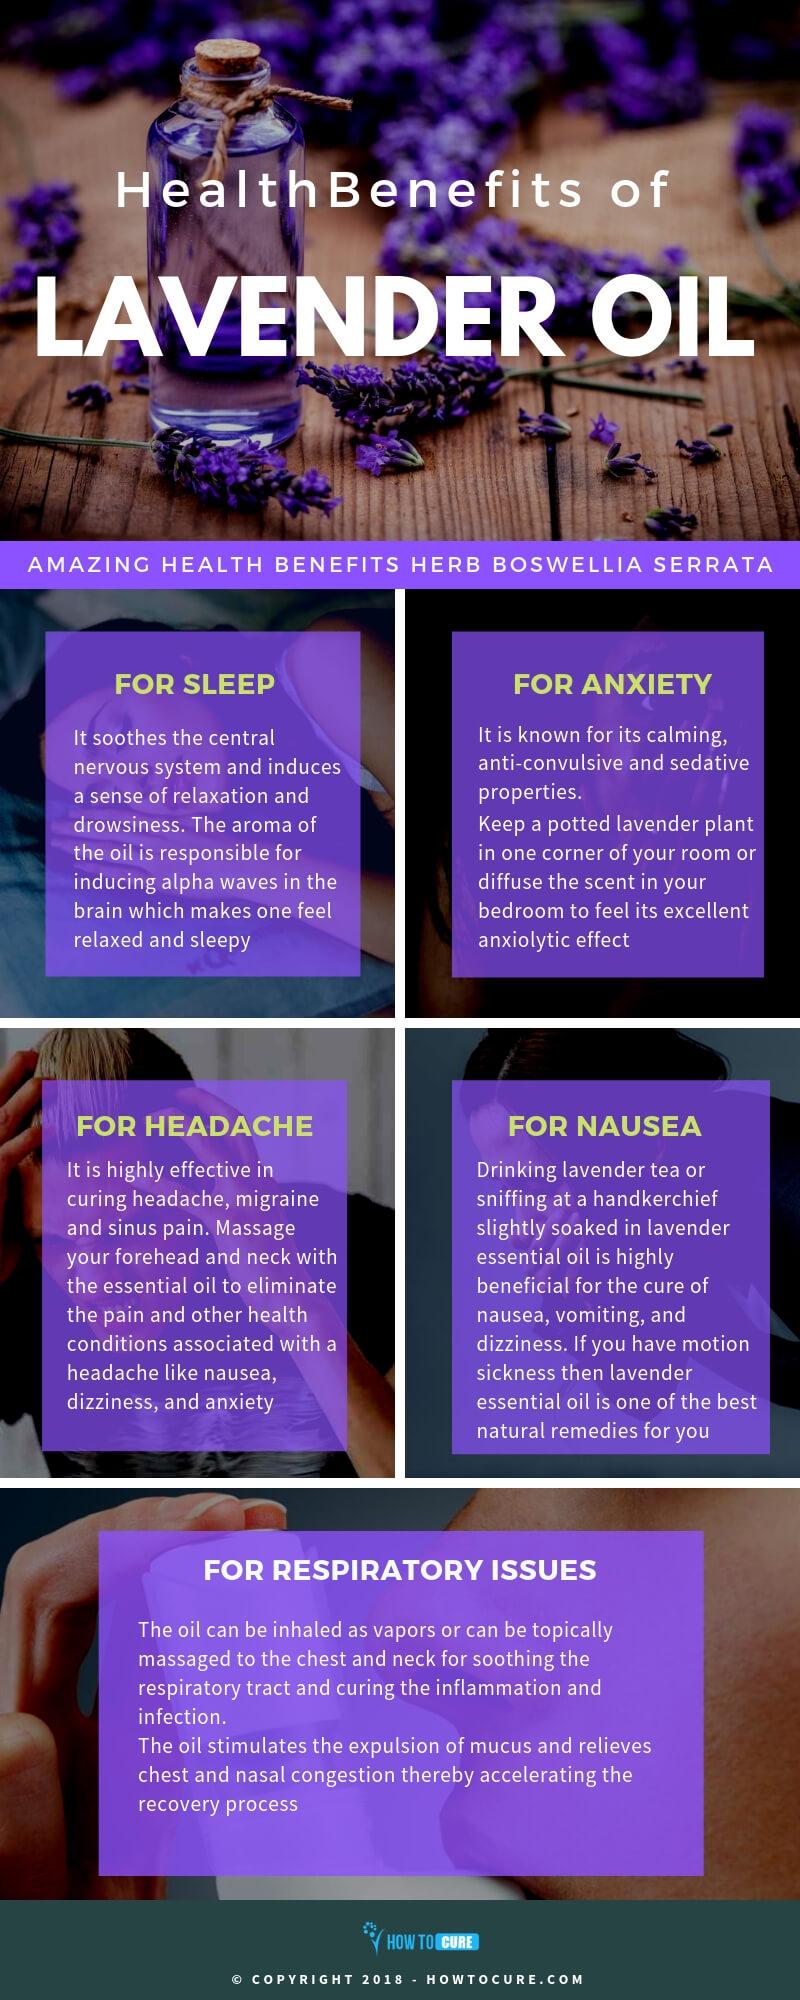 lavender oil benefits infographic